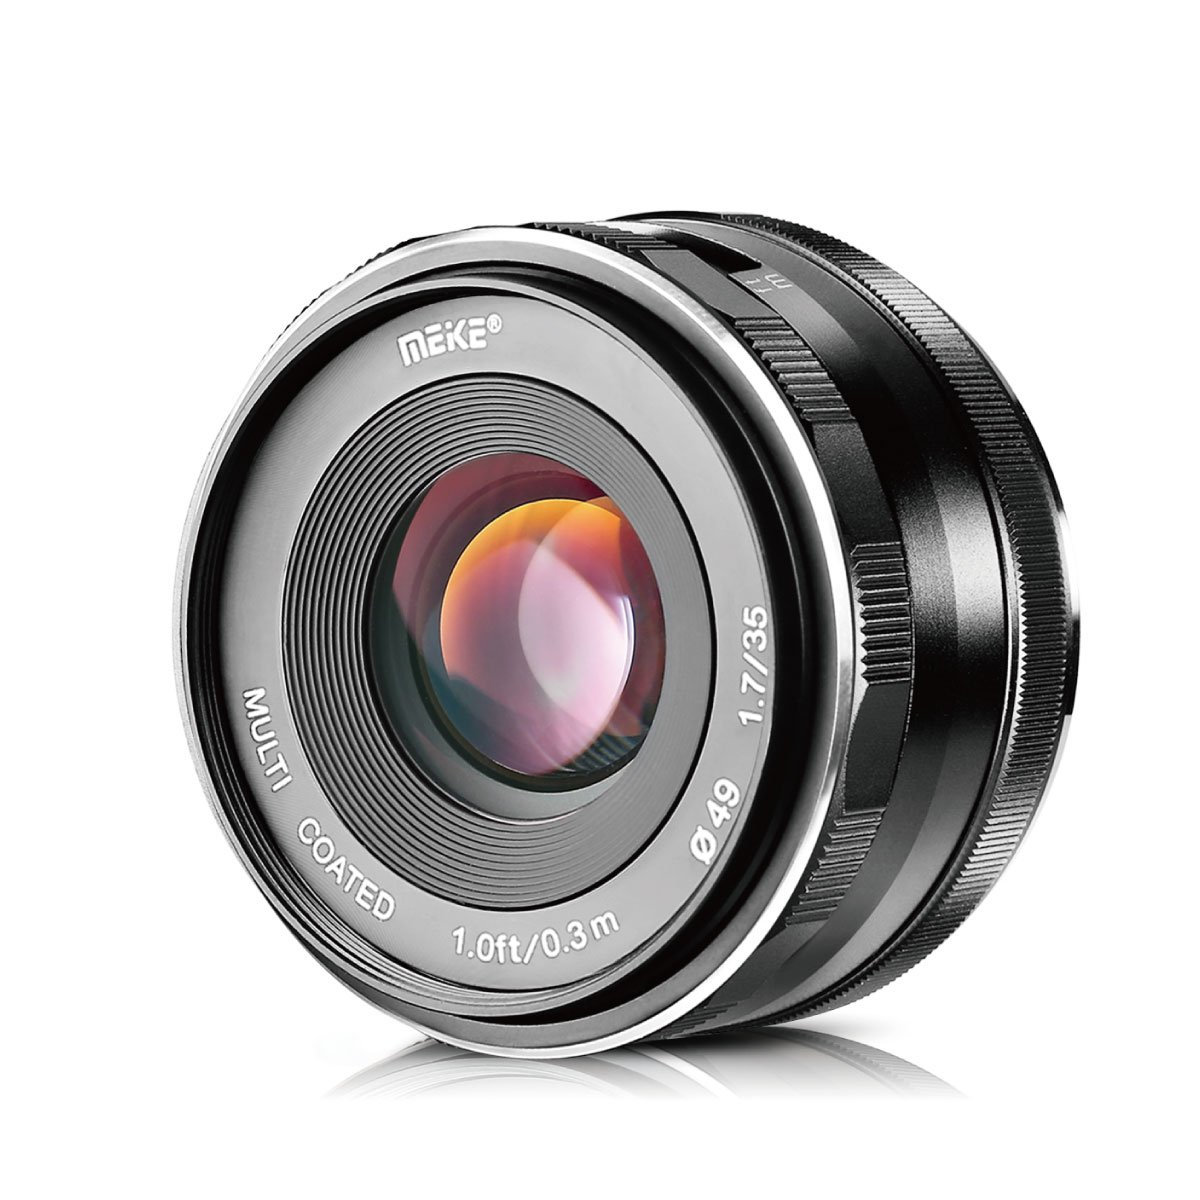 Meike 35mm f/1.7 Large Aperture Manual Focus APS-C Lens for Fujifilm X Mount Mirrorless Camera X-T3 X-H1 X-Pro2 X-E3 X-T1 X-T2 X-T10 X-T20 X-A2 X-E2 X-E2s X-E1 X30 X70 X-M1 X-A1 XPro1,etc by Meike